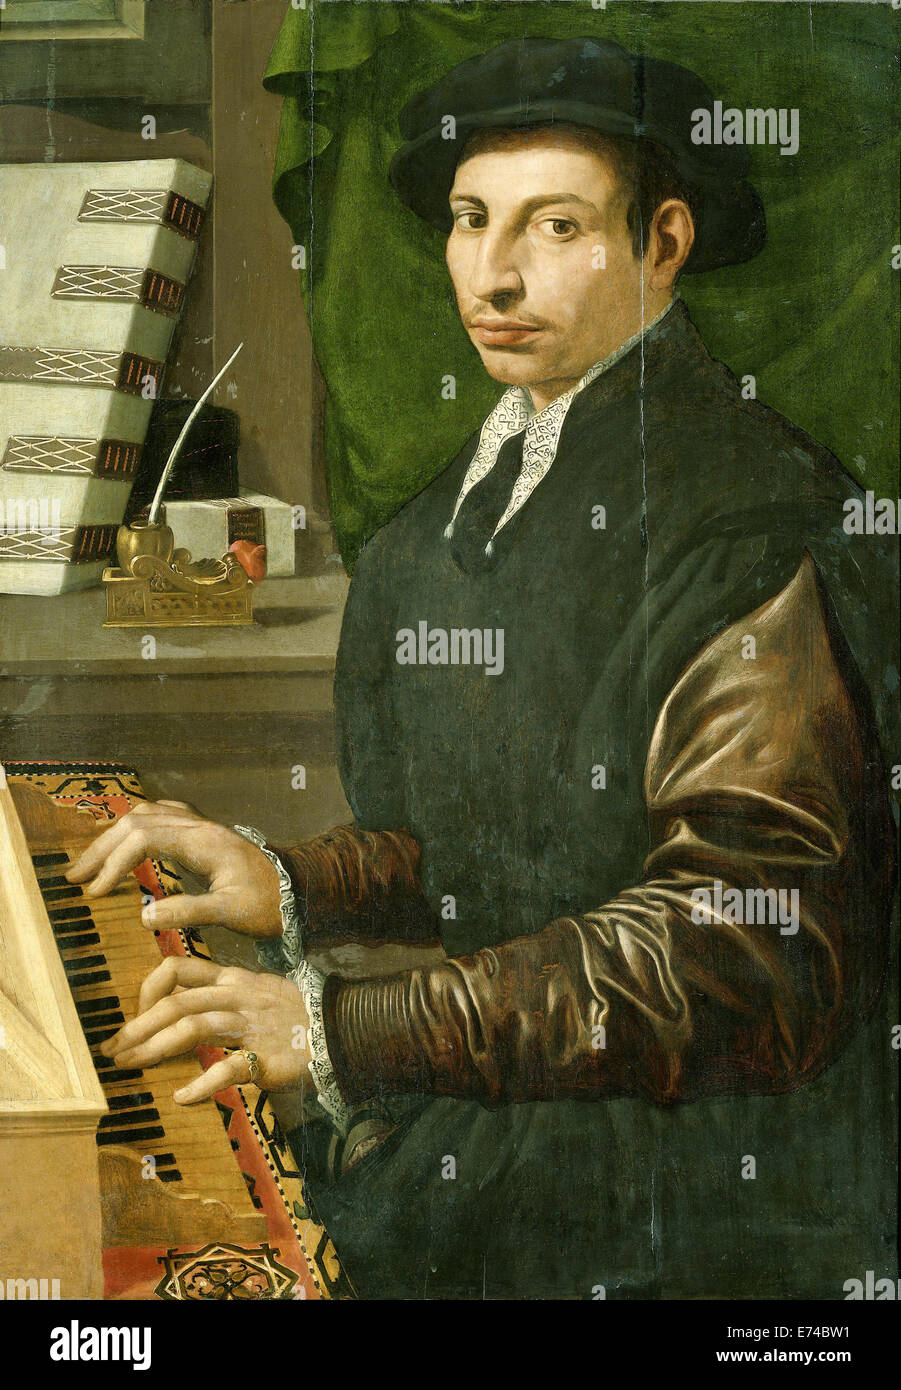 The Shamrock Chord Player - by Francesco Traballesi, 1554 - 1570 - Stock Image